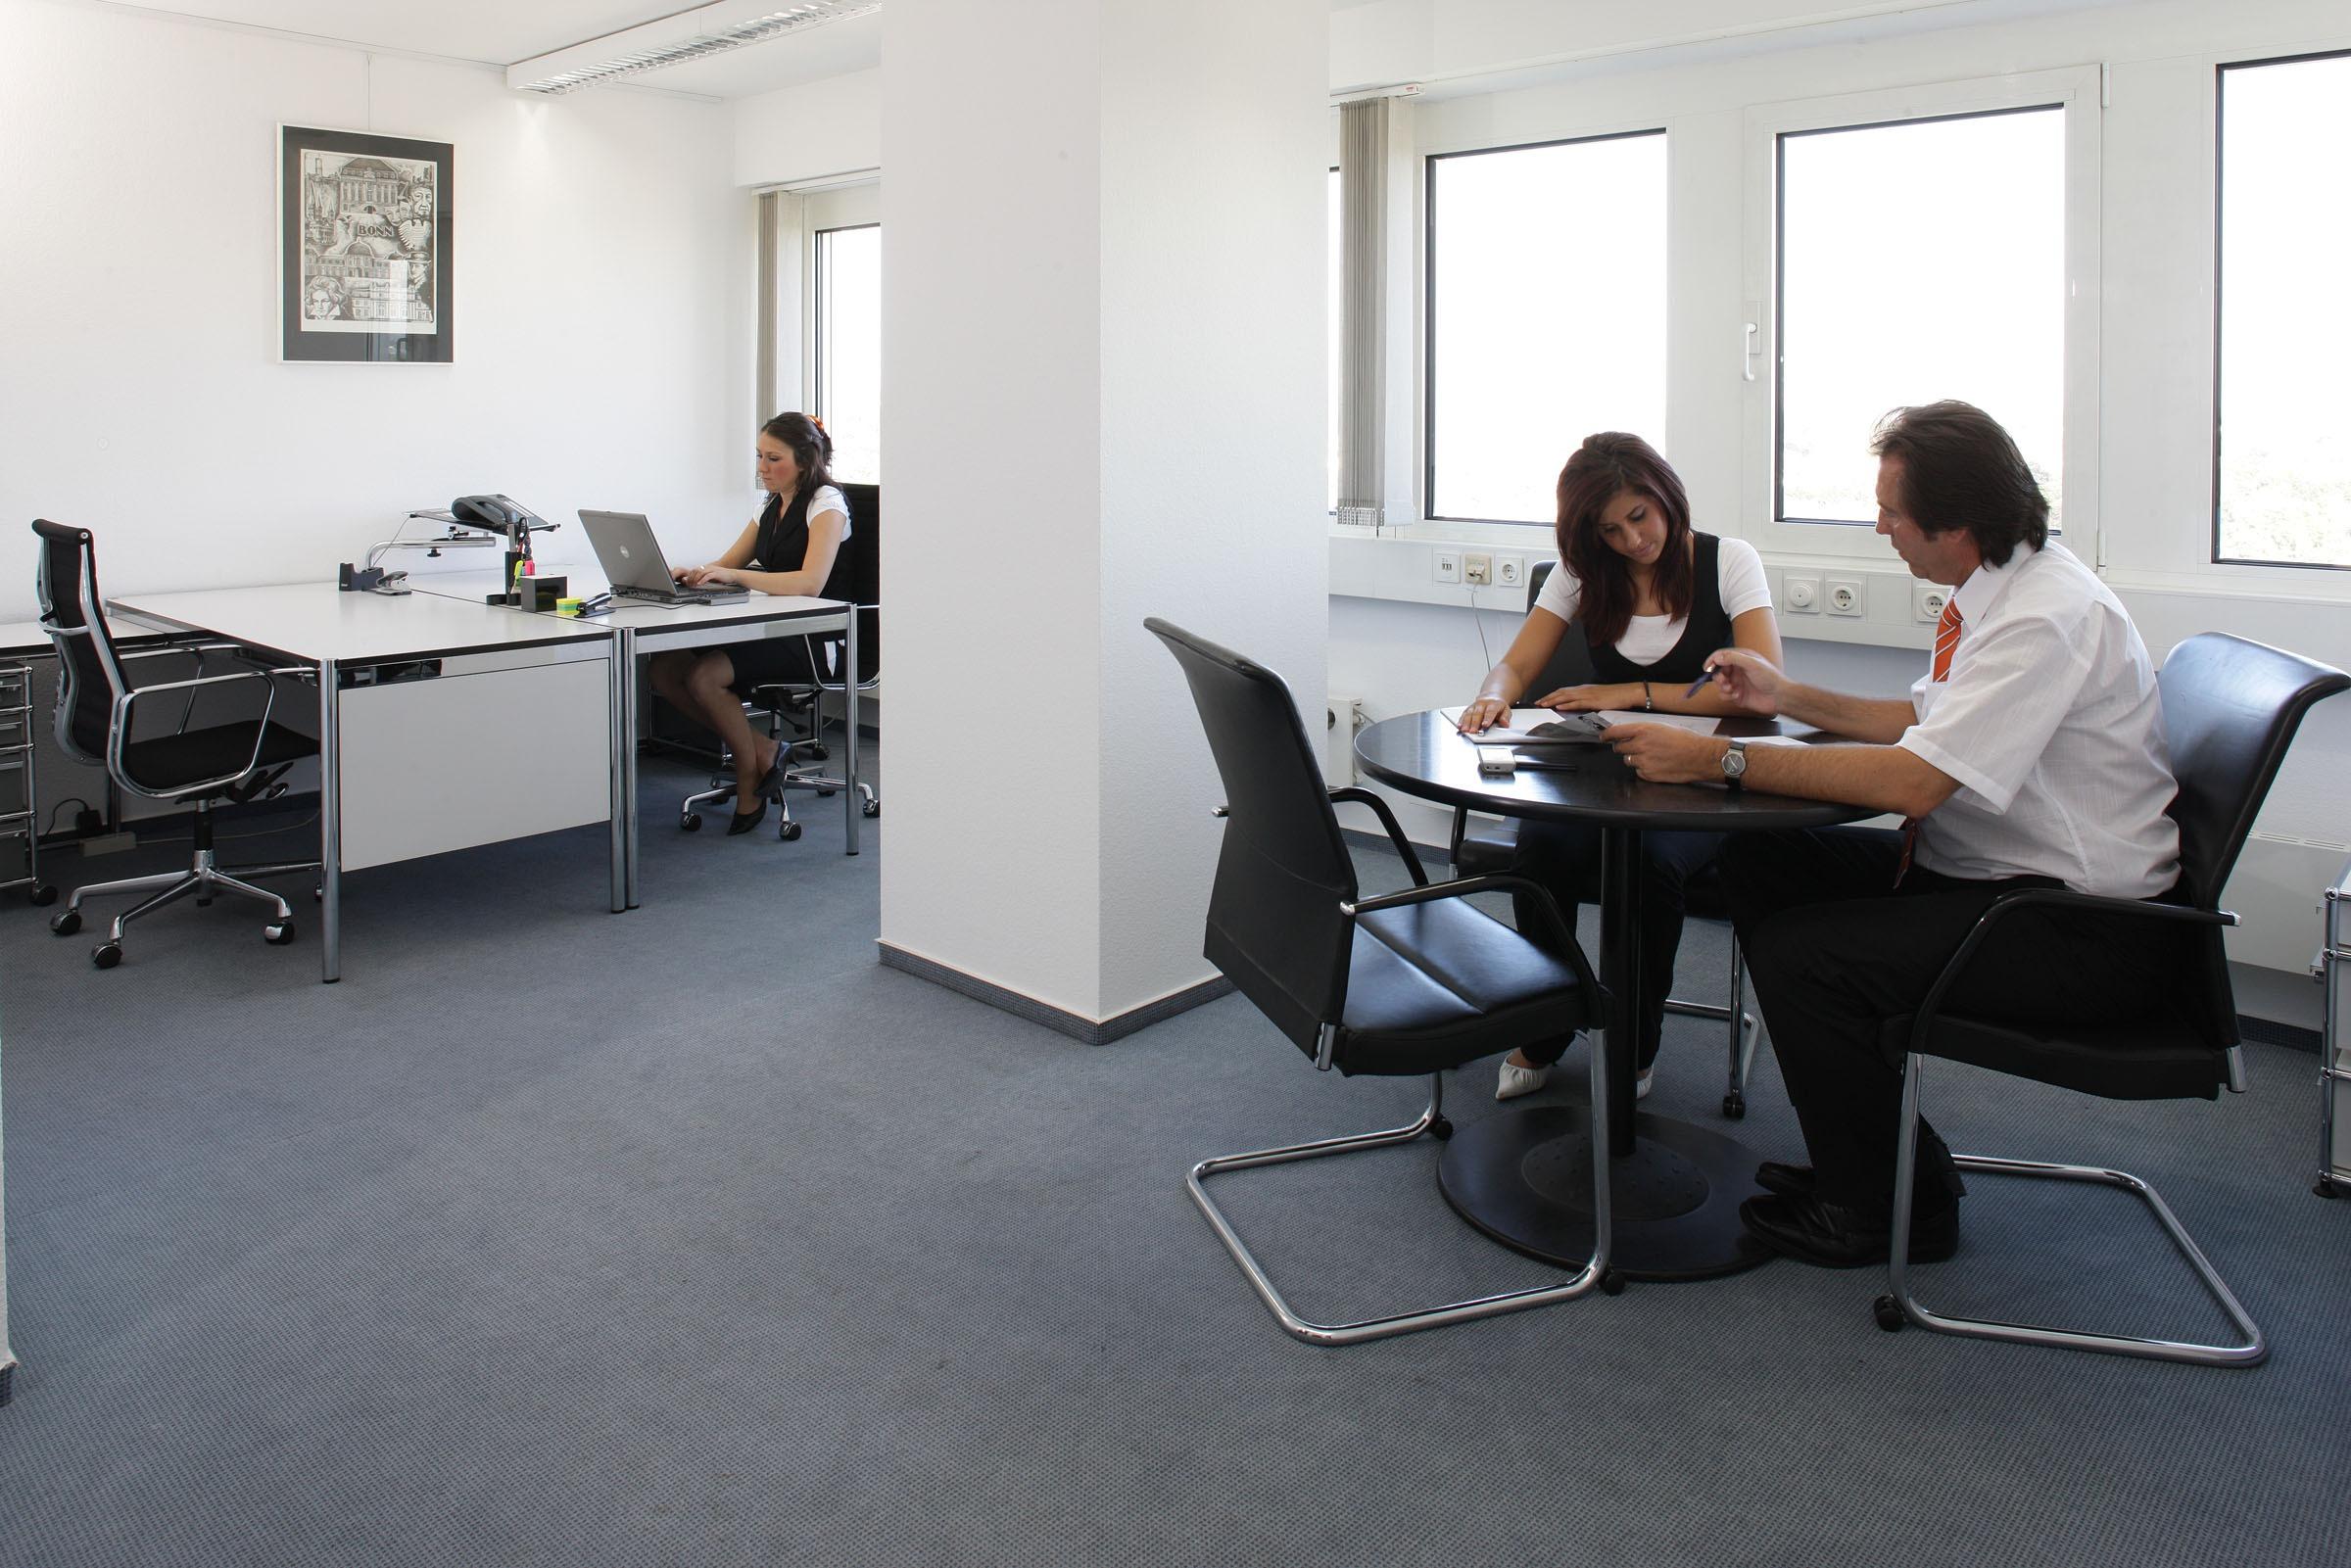 Bildet : møte, kontor, møbler, rom, sitte, personale ...